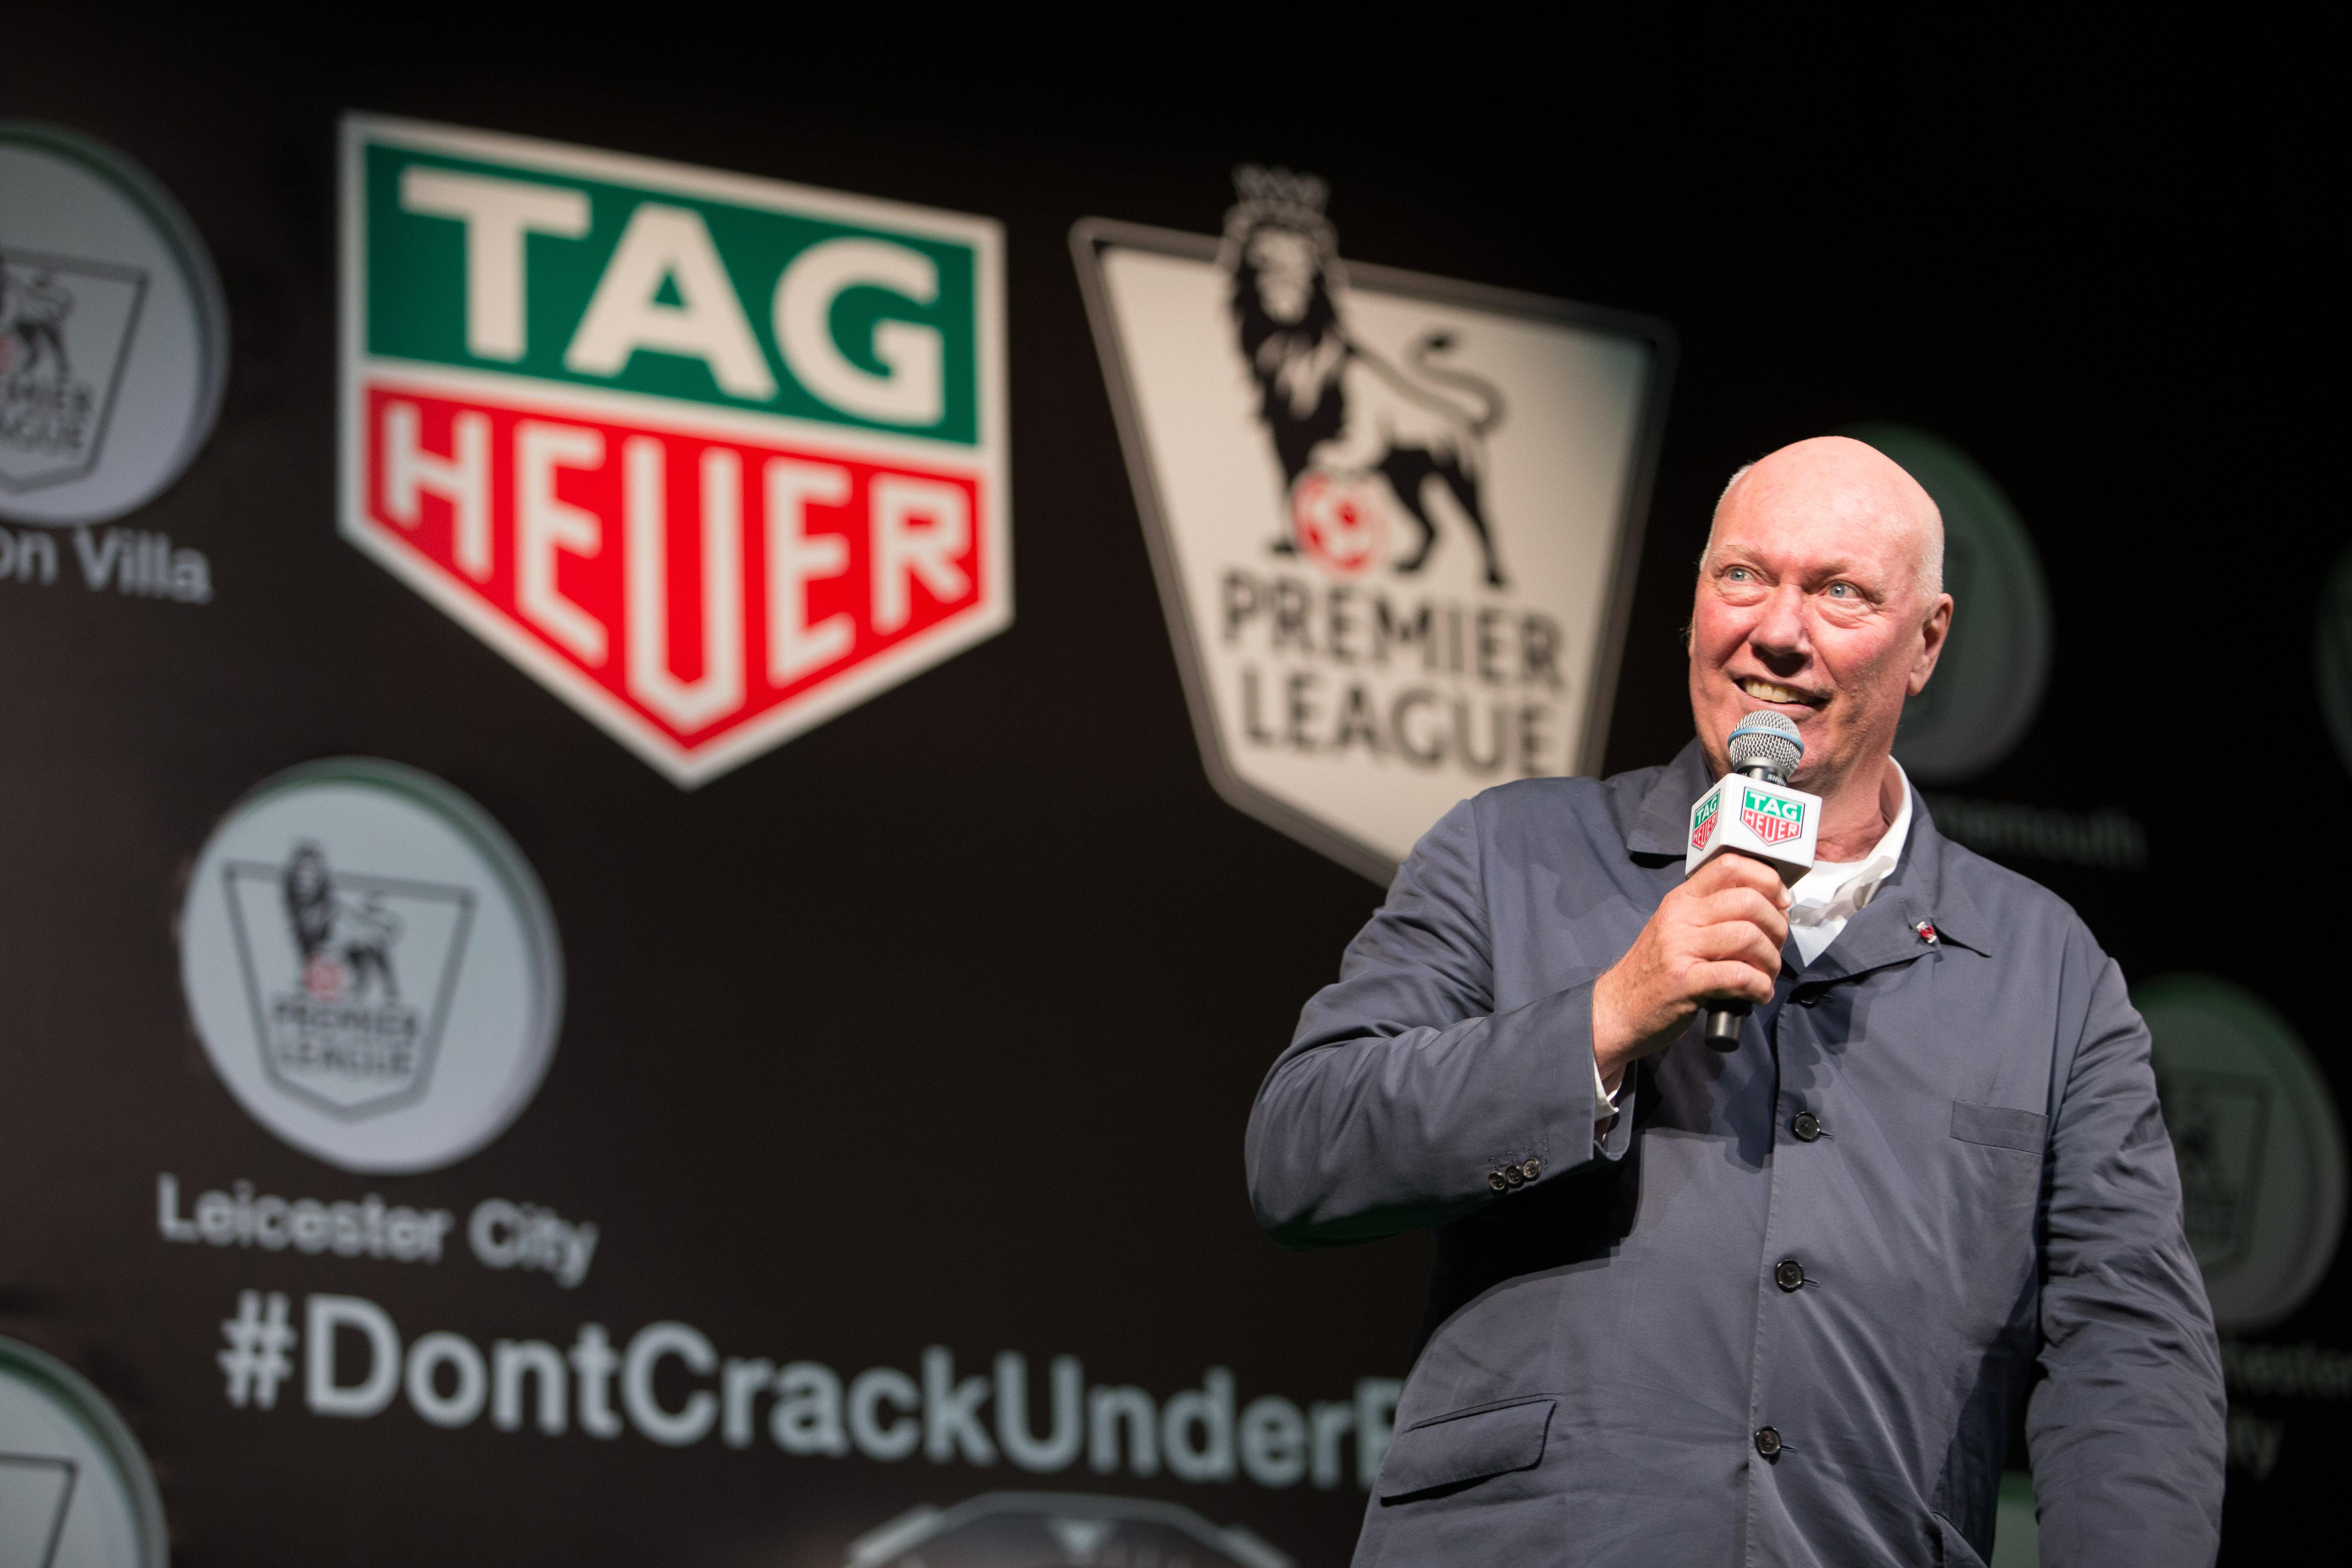 TAG Heuer & Premier League in HK (2)